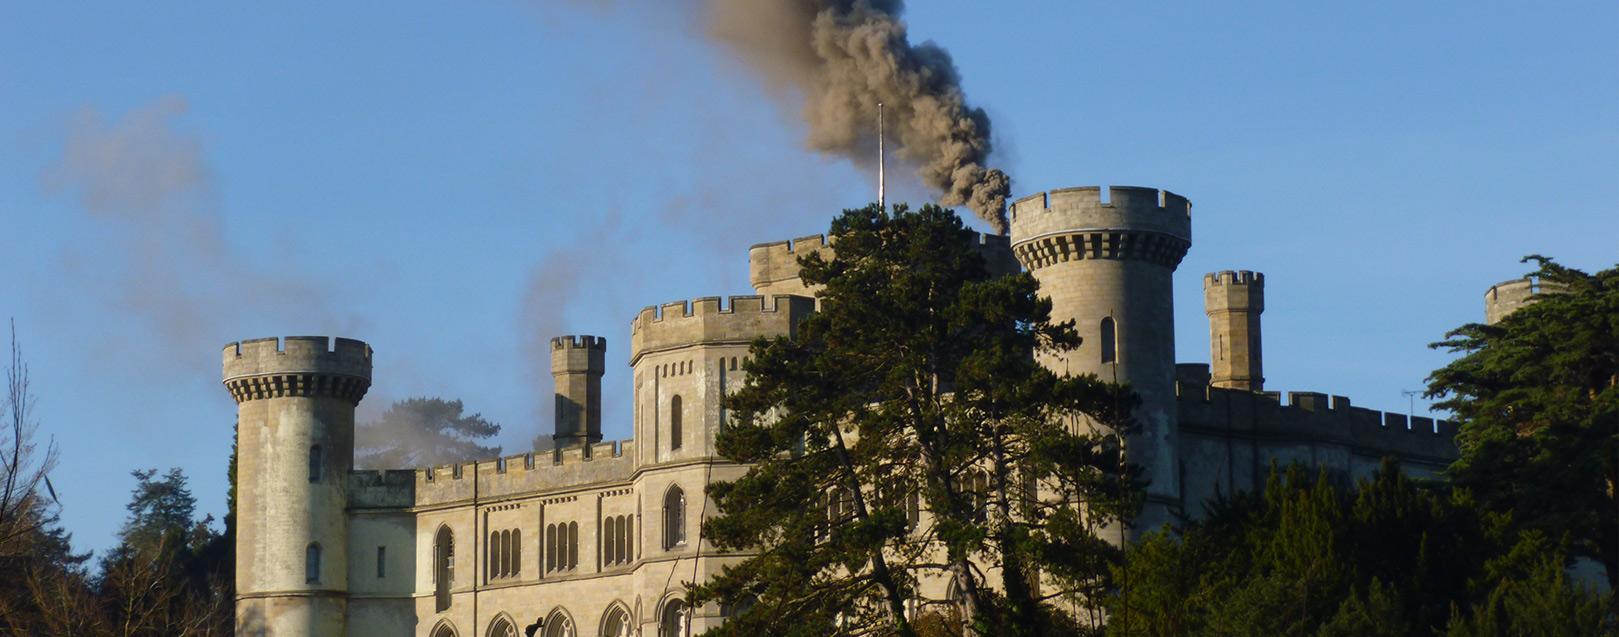 woodburner installers Oxfordshire